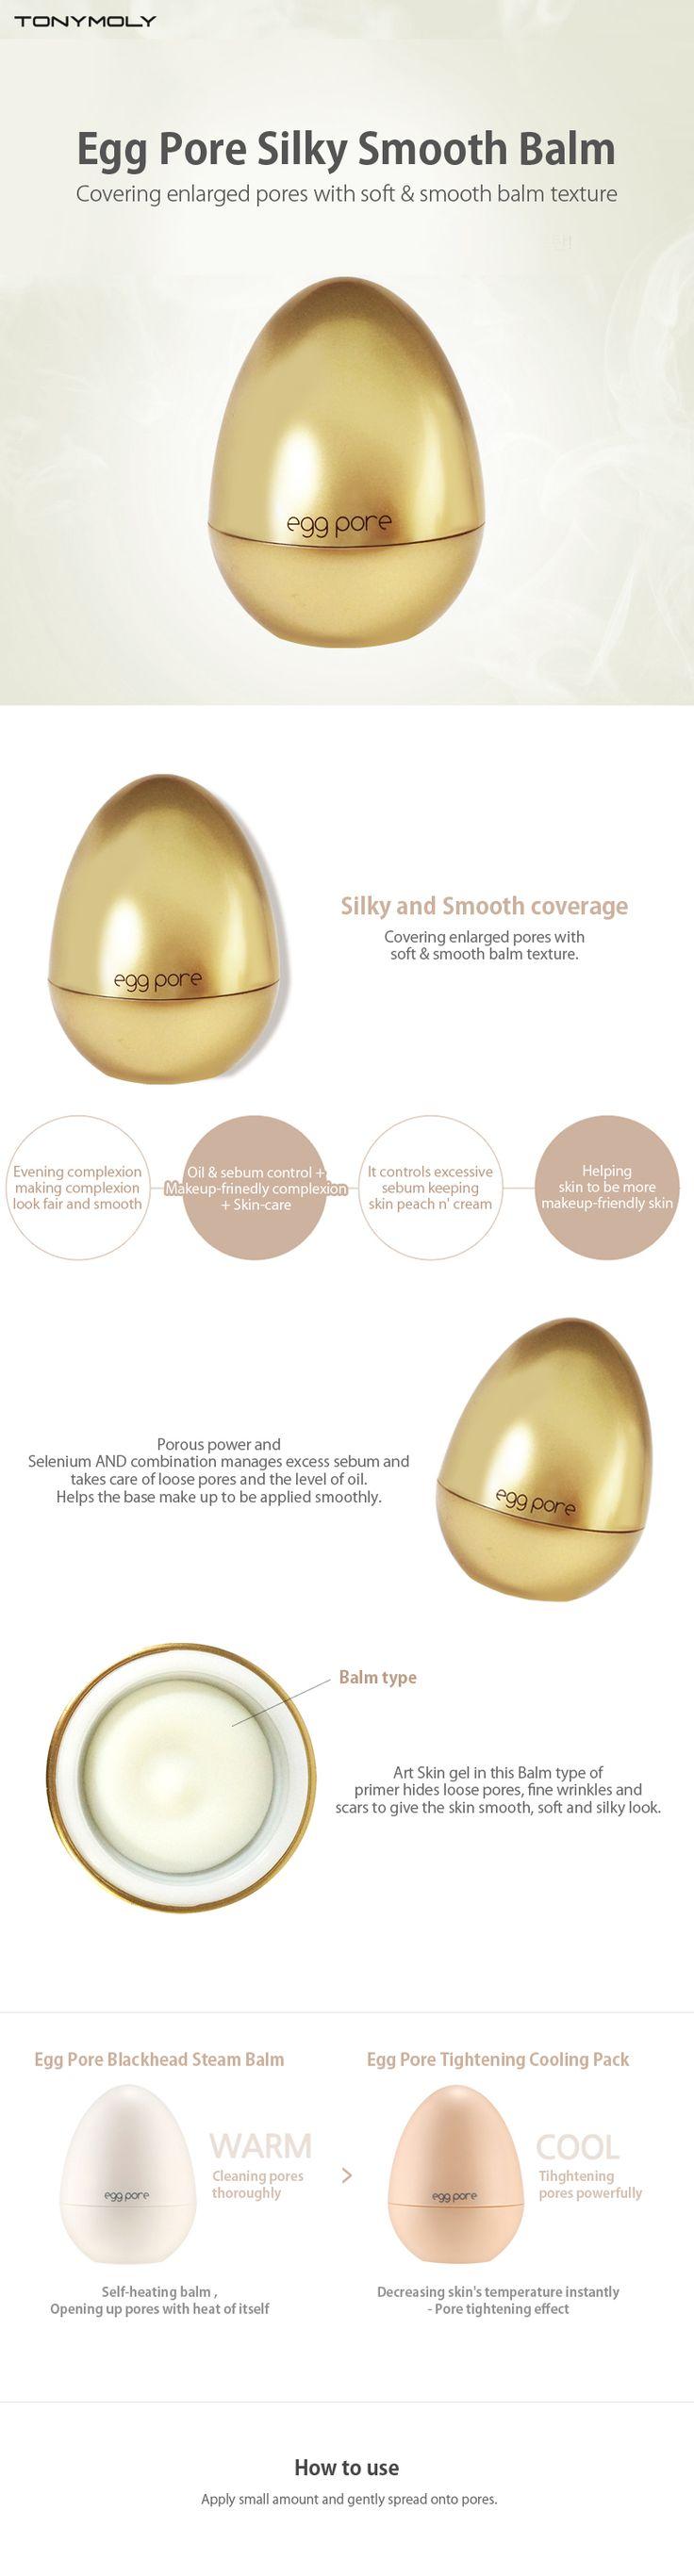 Tonymoly New Egg Pore Silky Smooth Balm 20g - Tonymoly Beautynetkorea Korean cosmetic